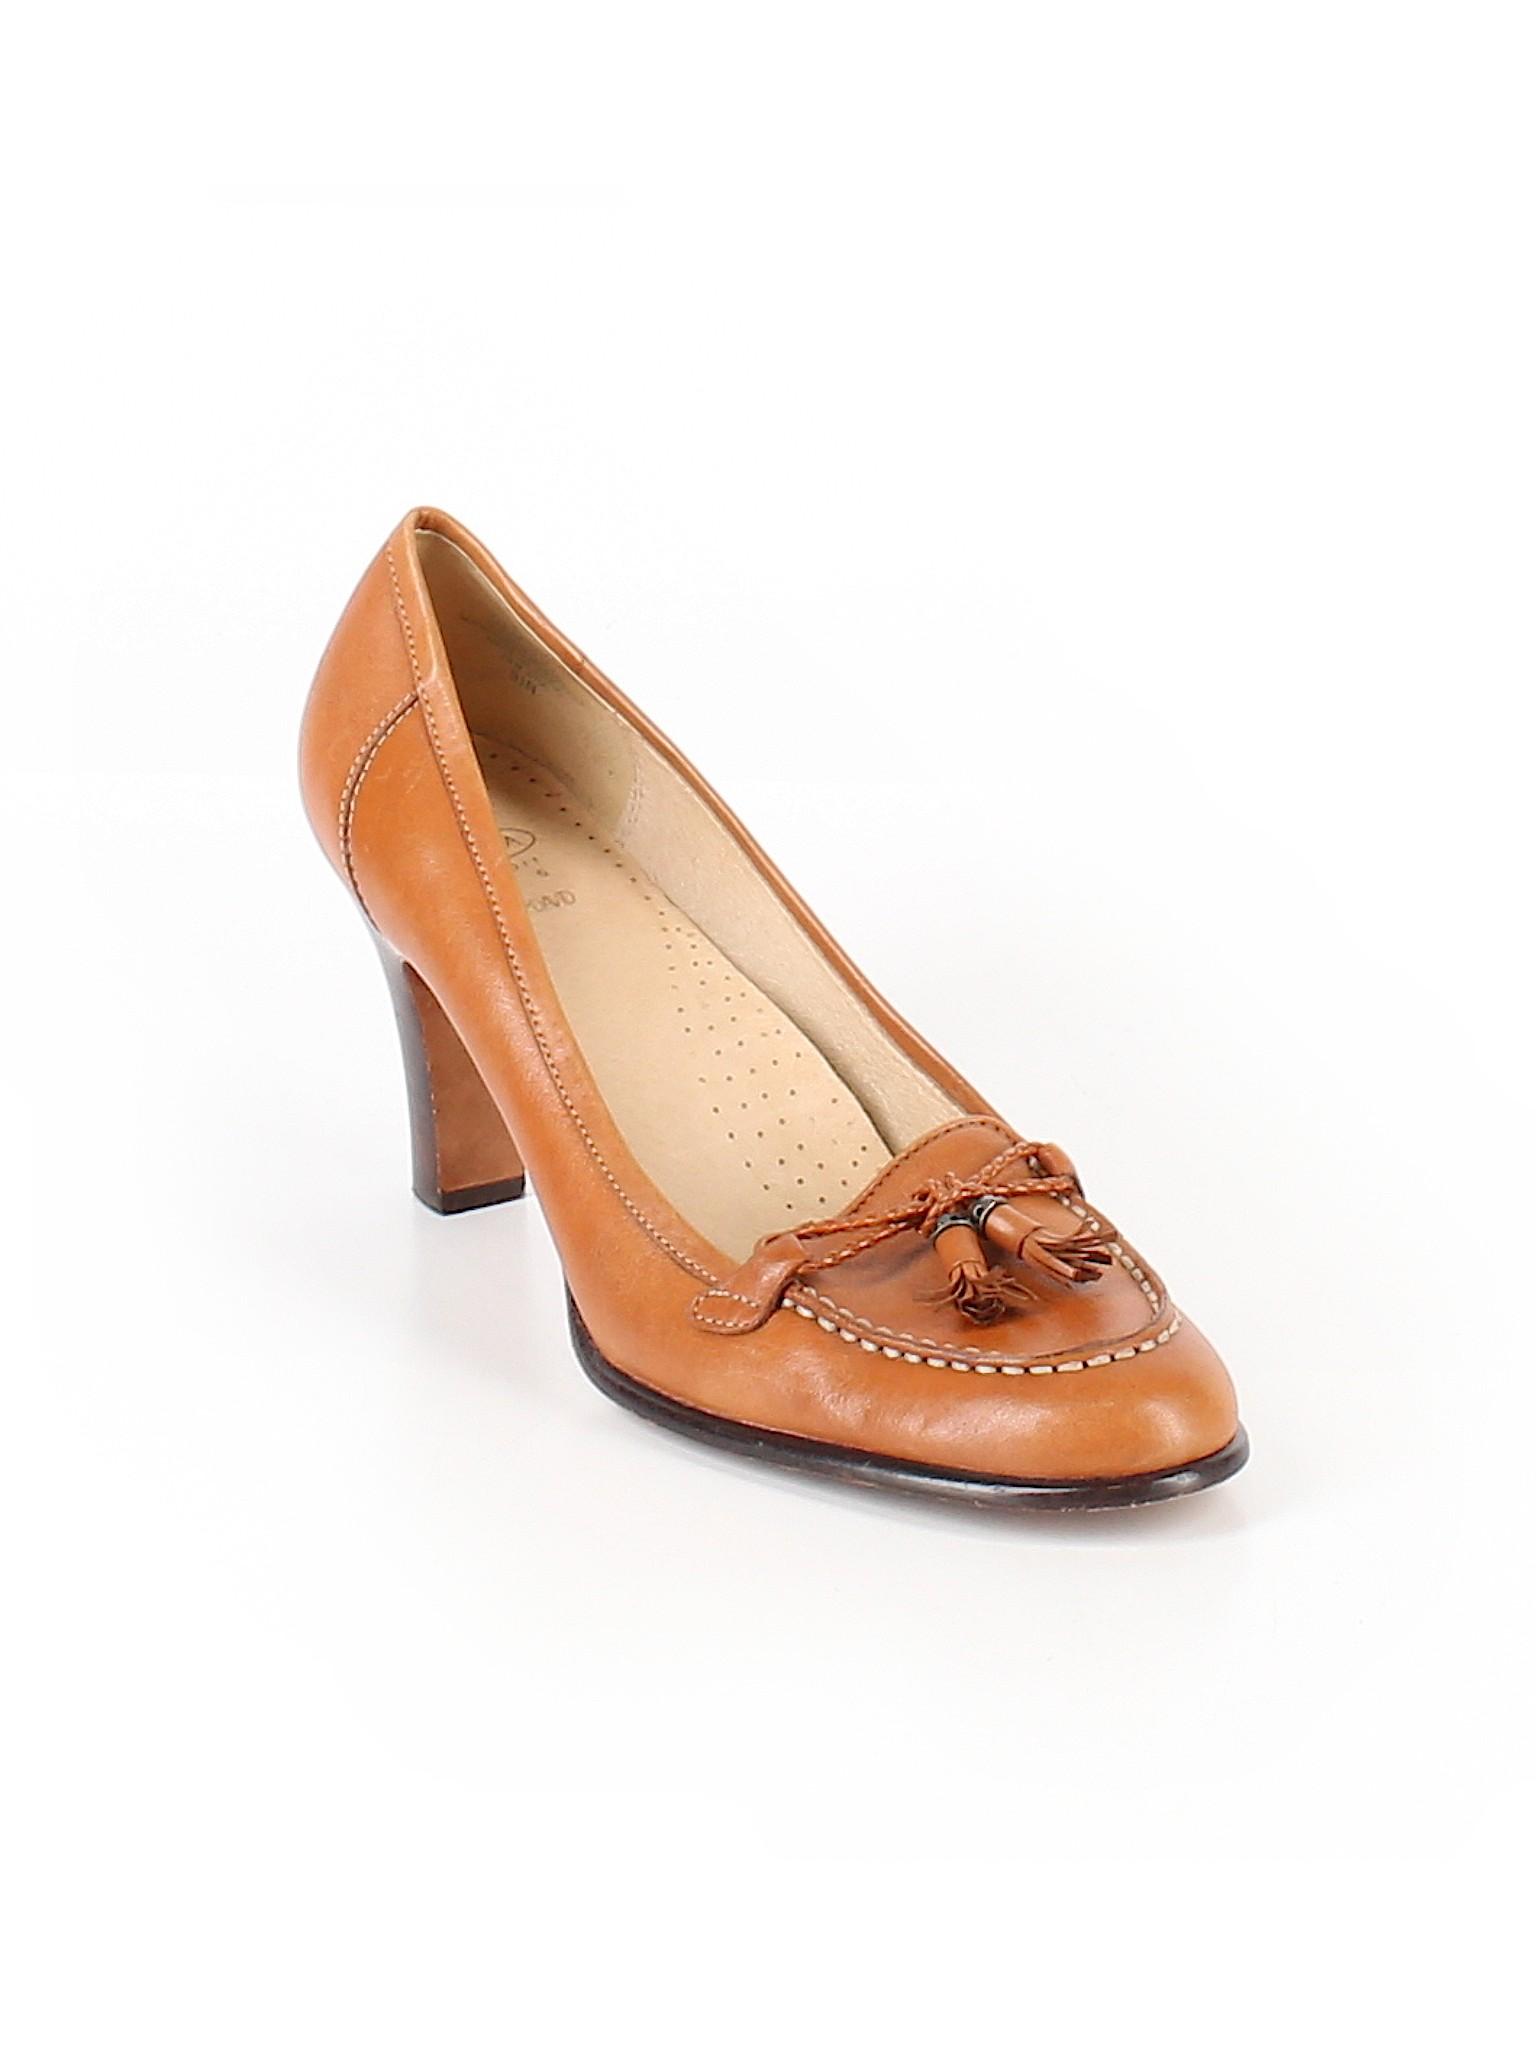 Boutique Circa amp; Joan promotion Heels David rTqr4Pw